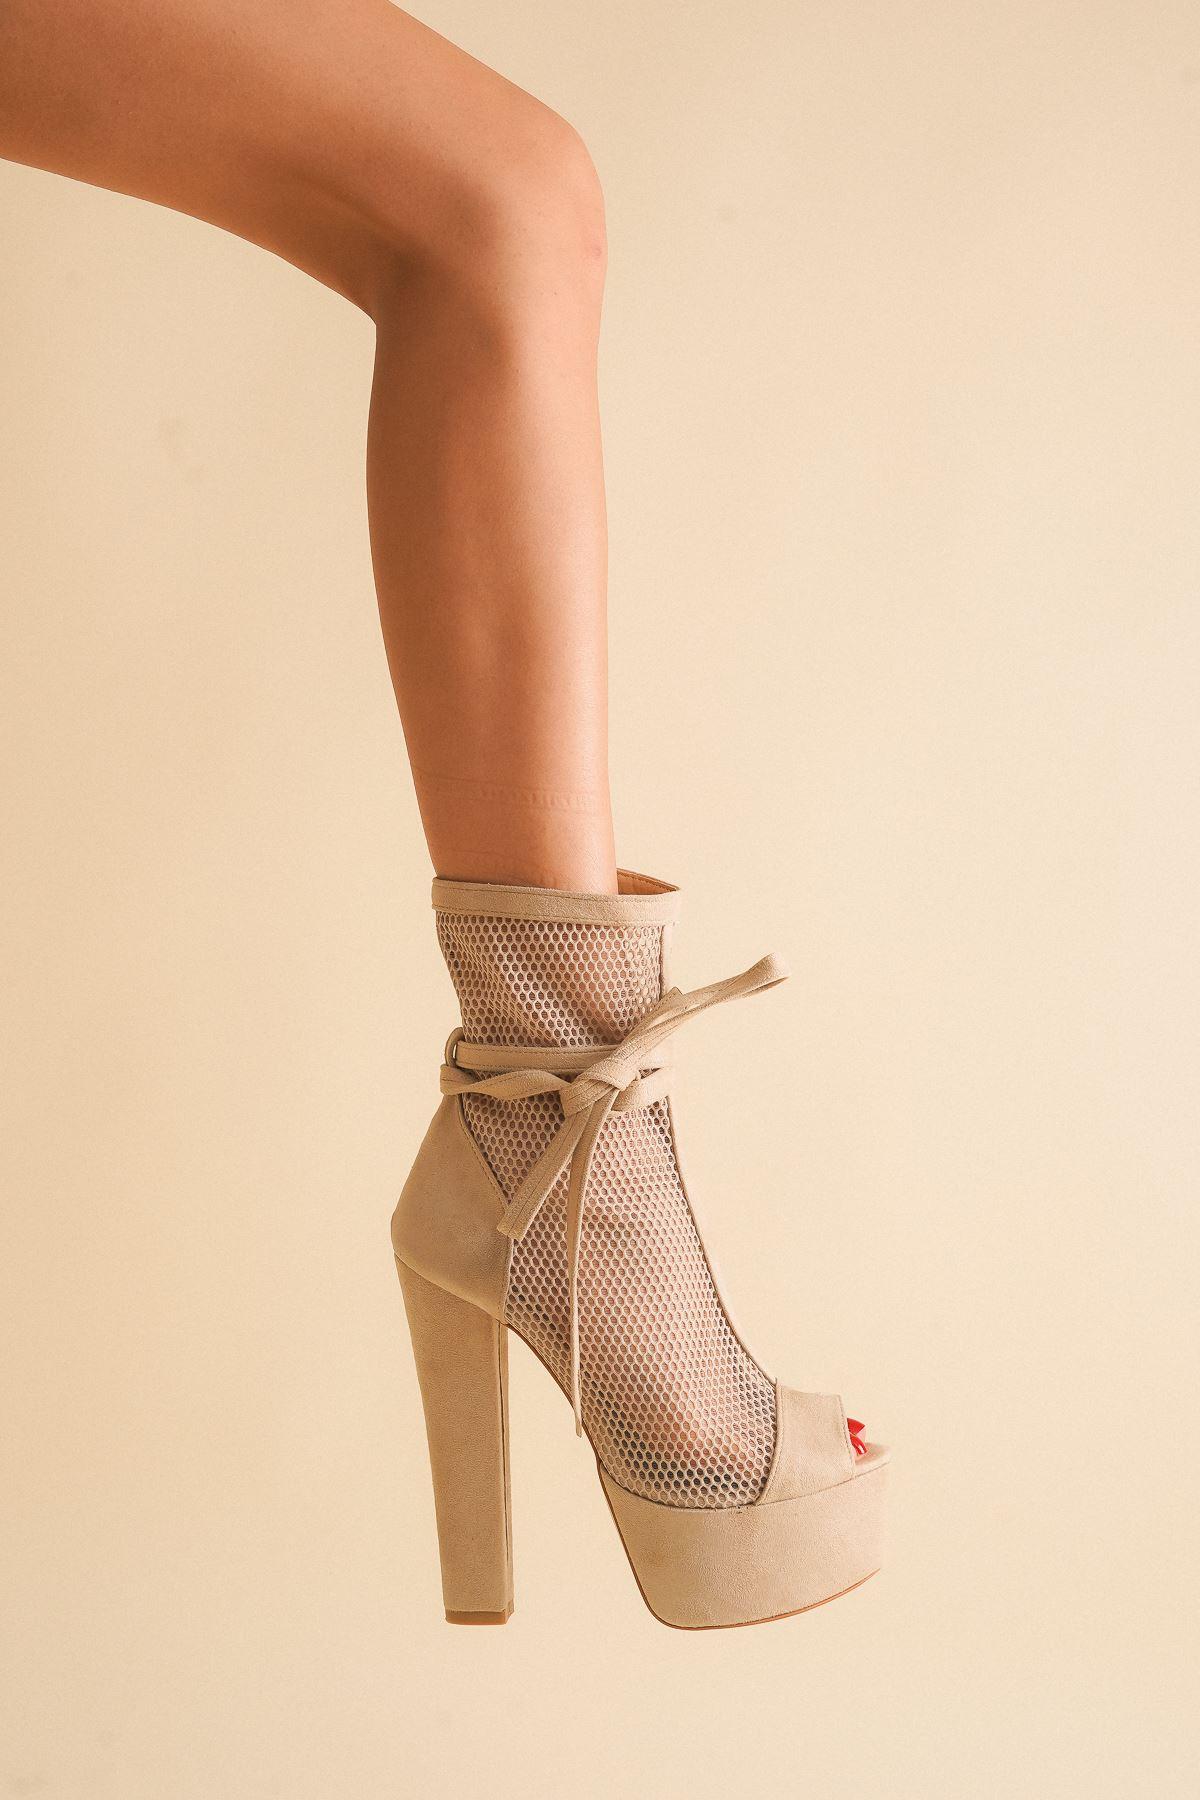 Parisa Ten Süet Yüksek Topuklu Ayakkabı